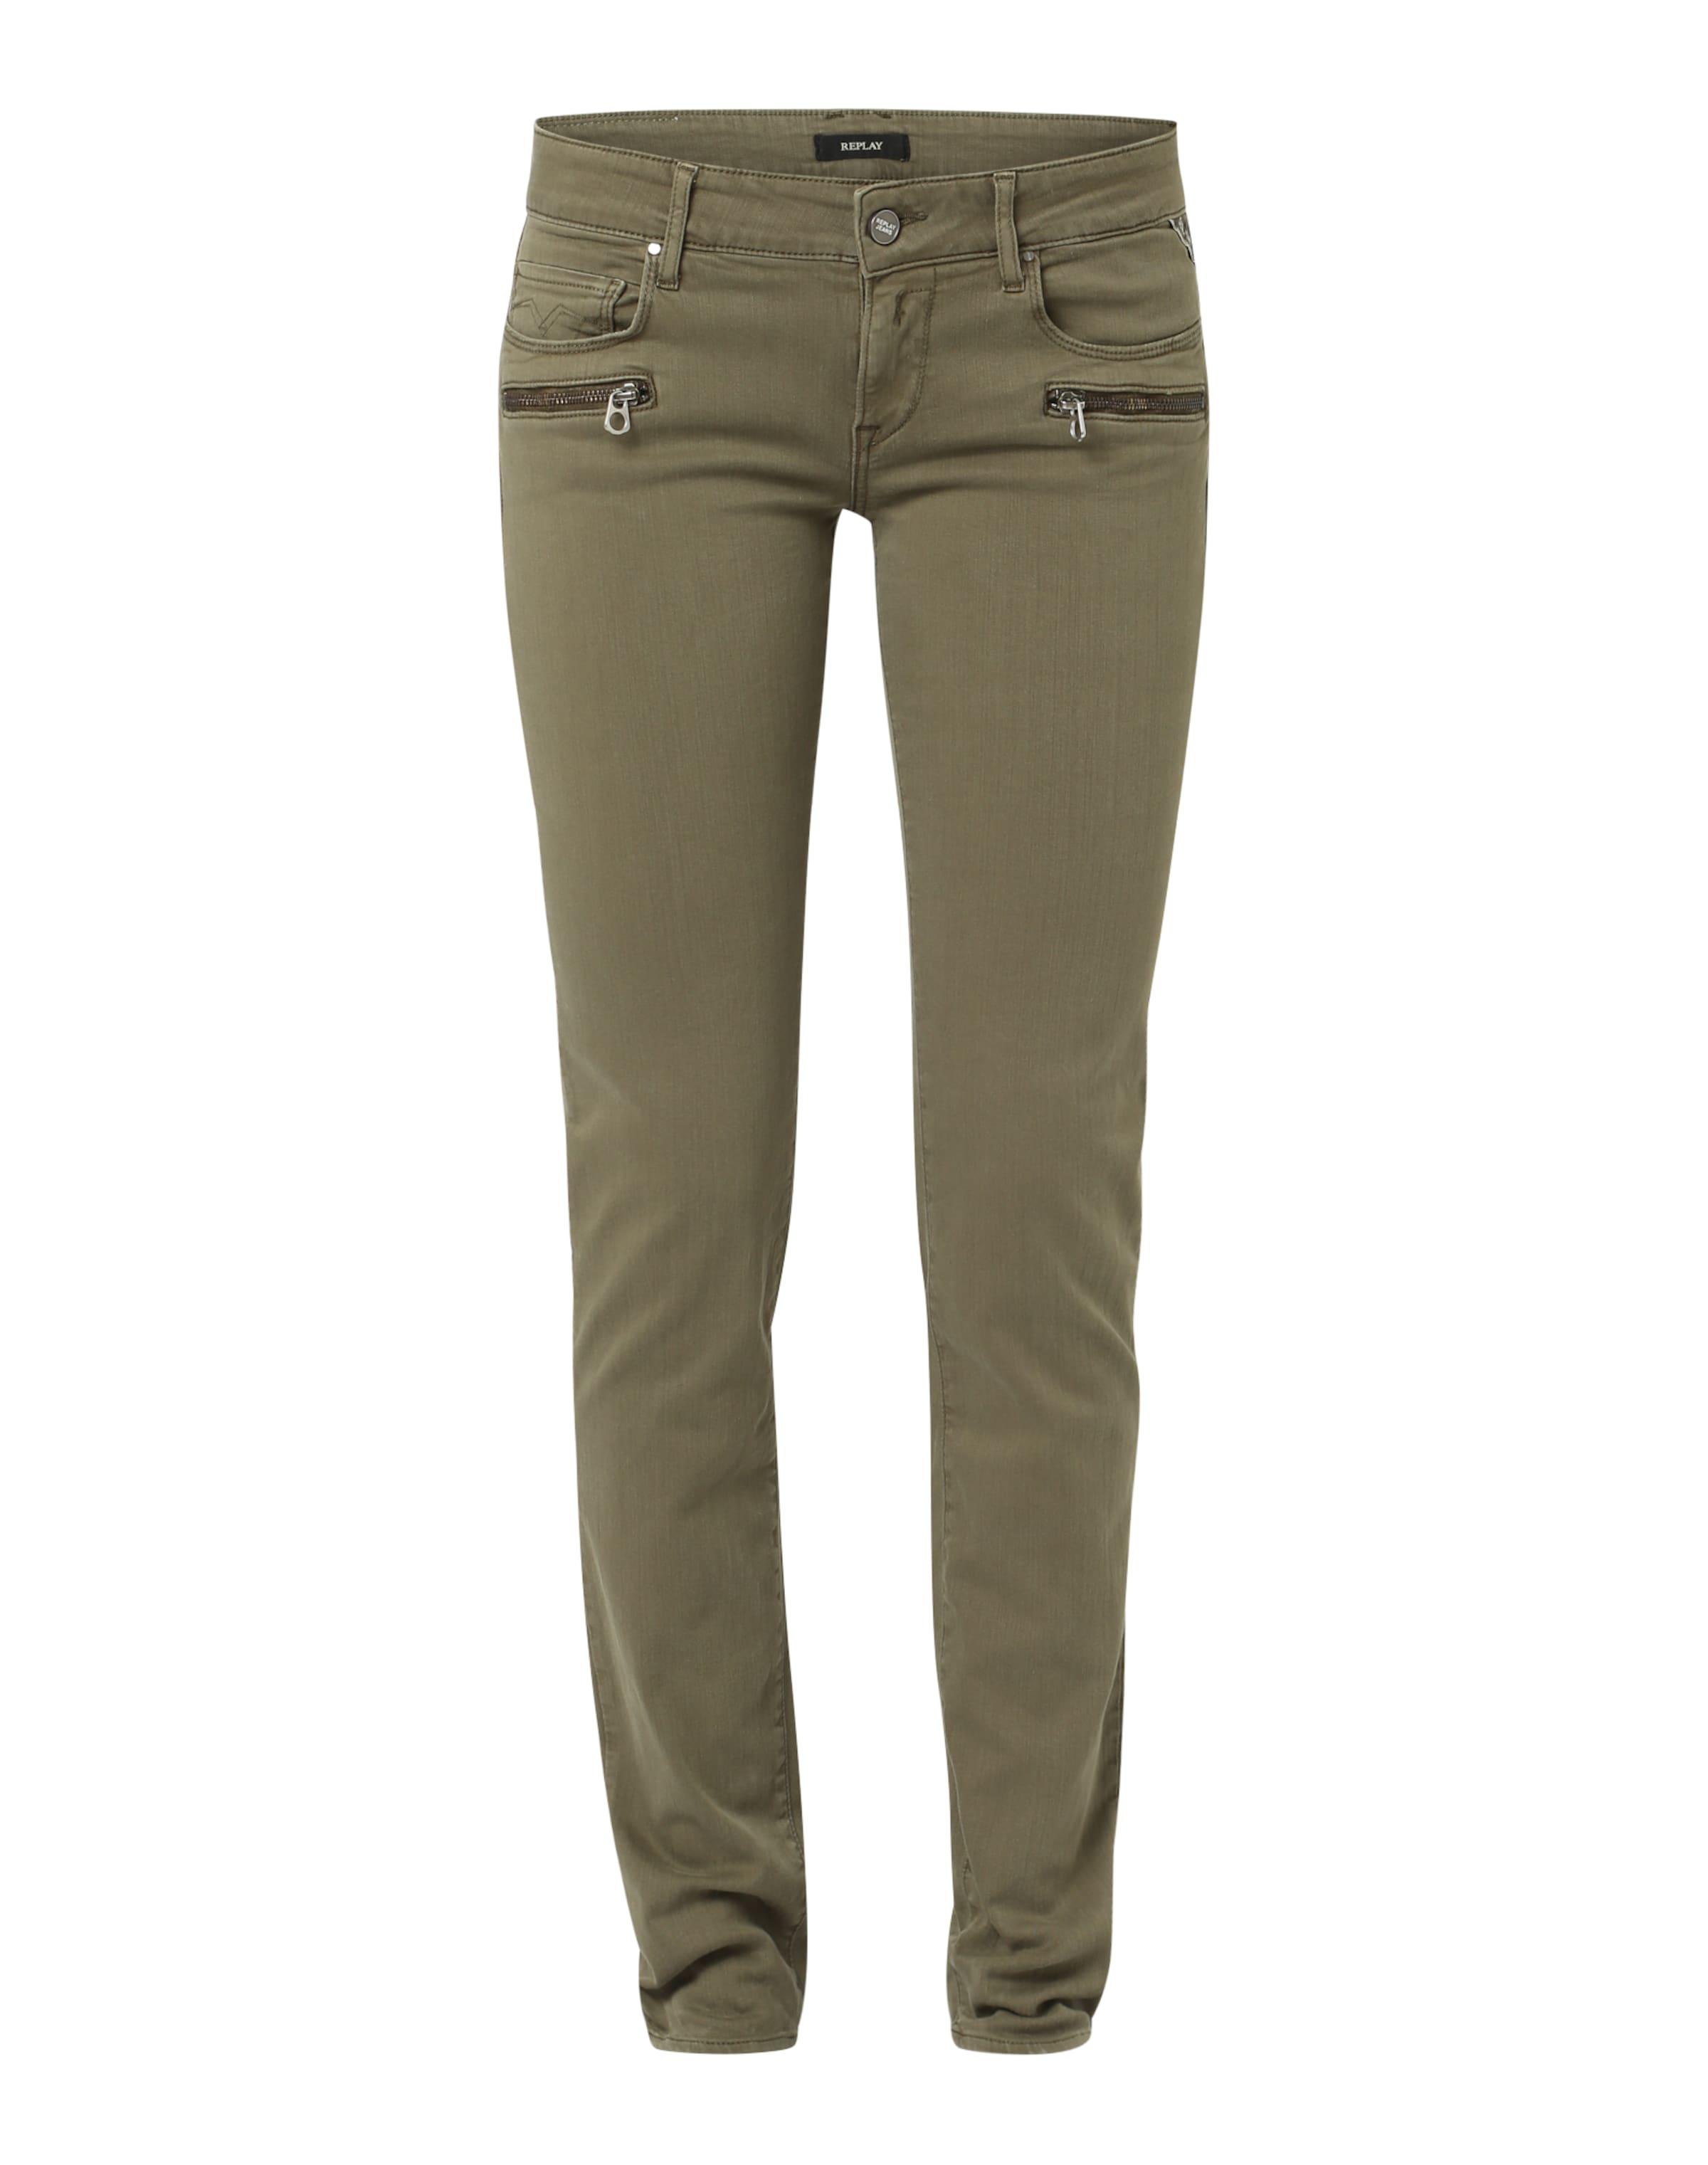 REPLAY Skinny Jeans 'Brigidot' Neue Online-Verkauf Spielraum Niedrigen Preis Versandgebühr N2oBbgp